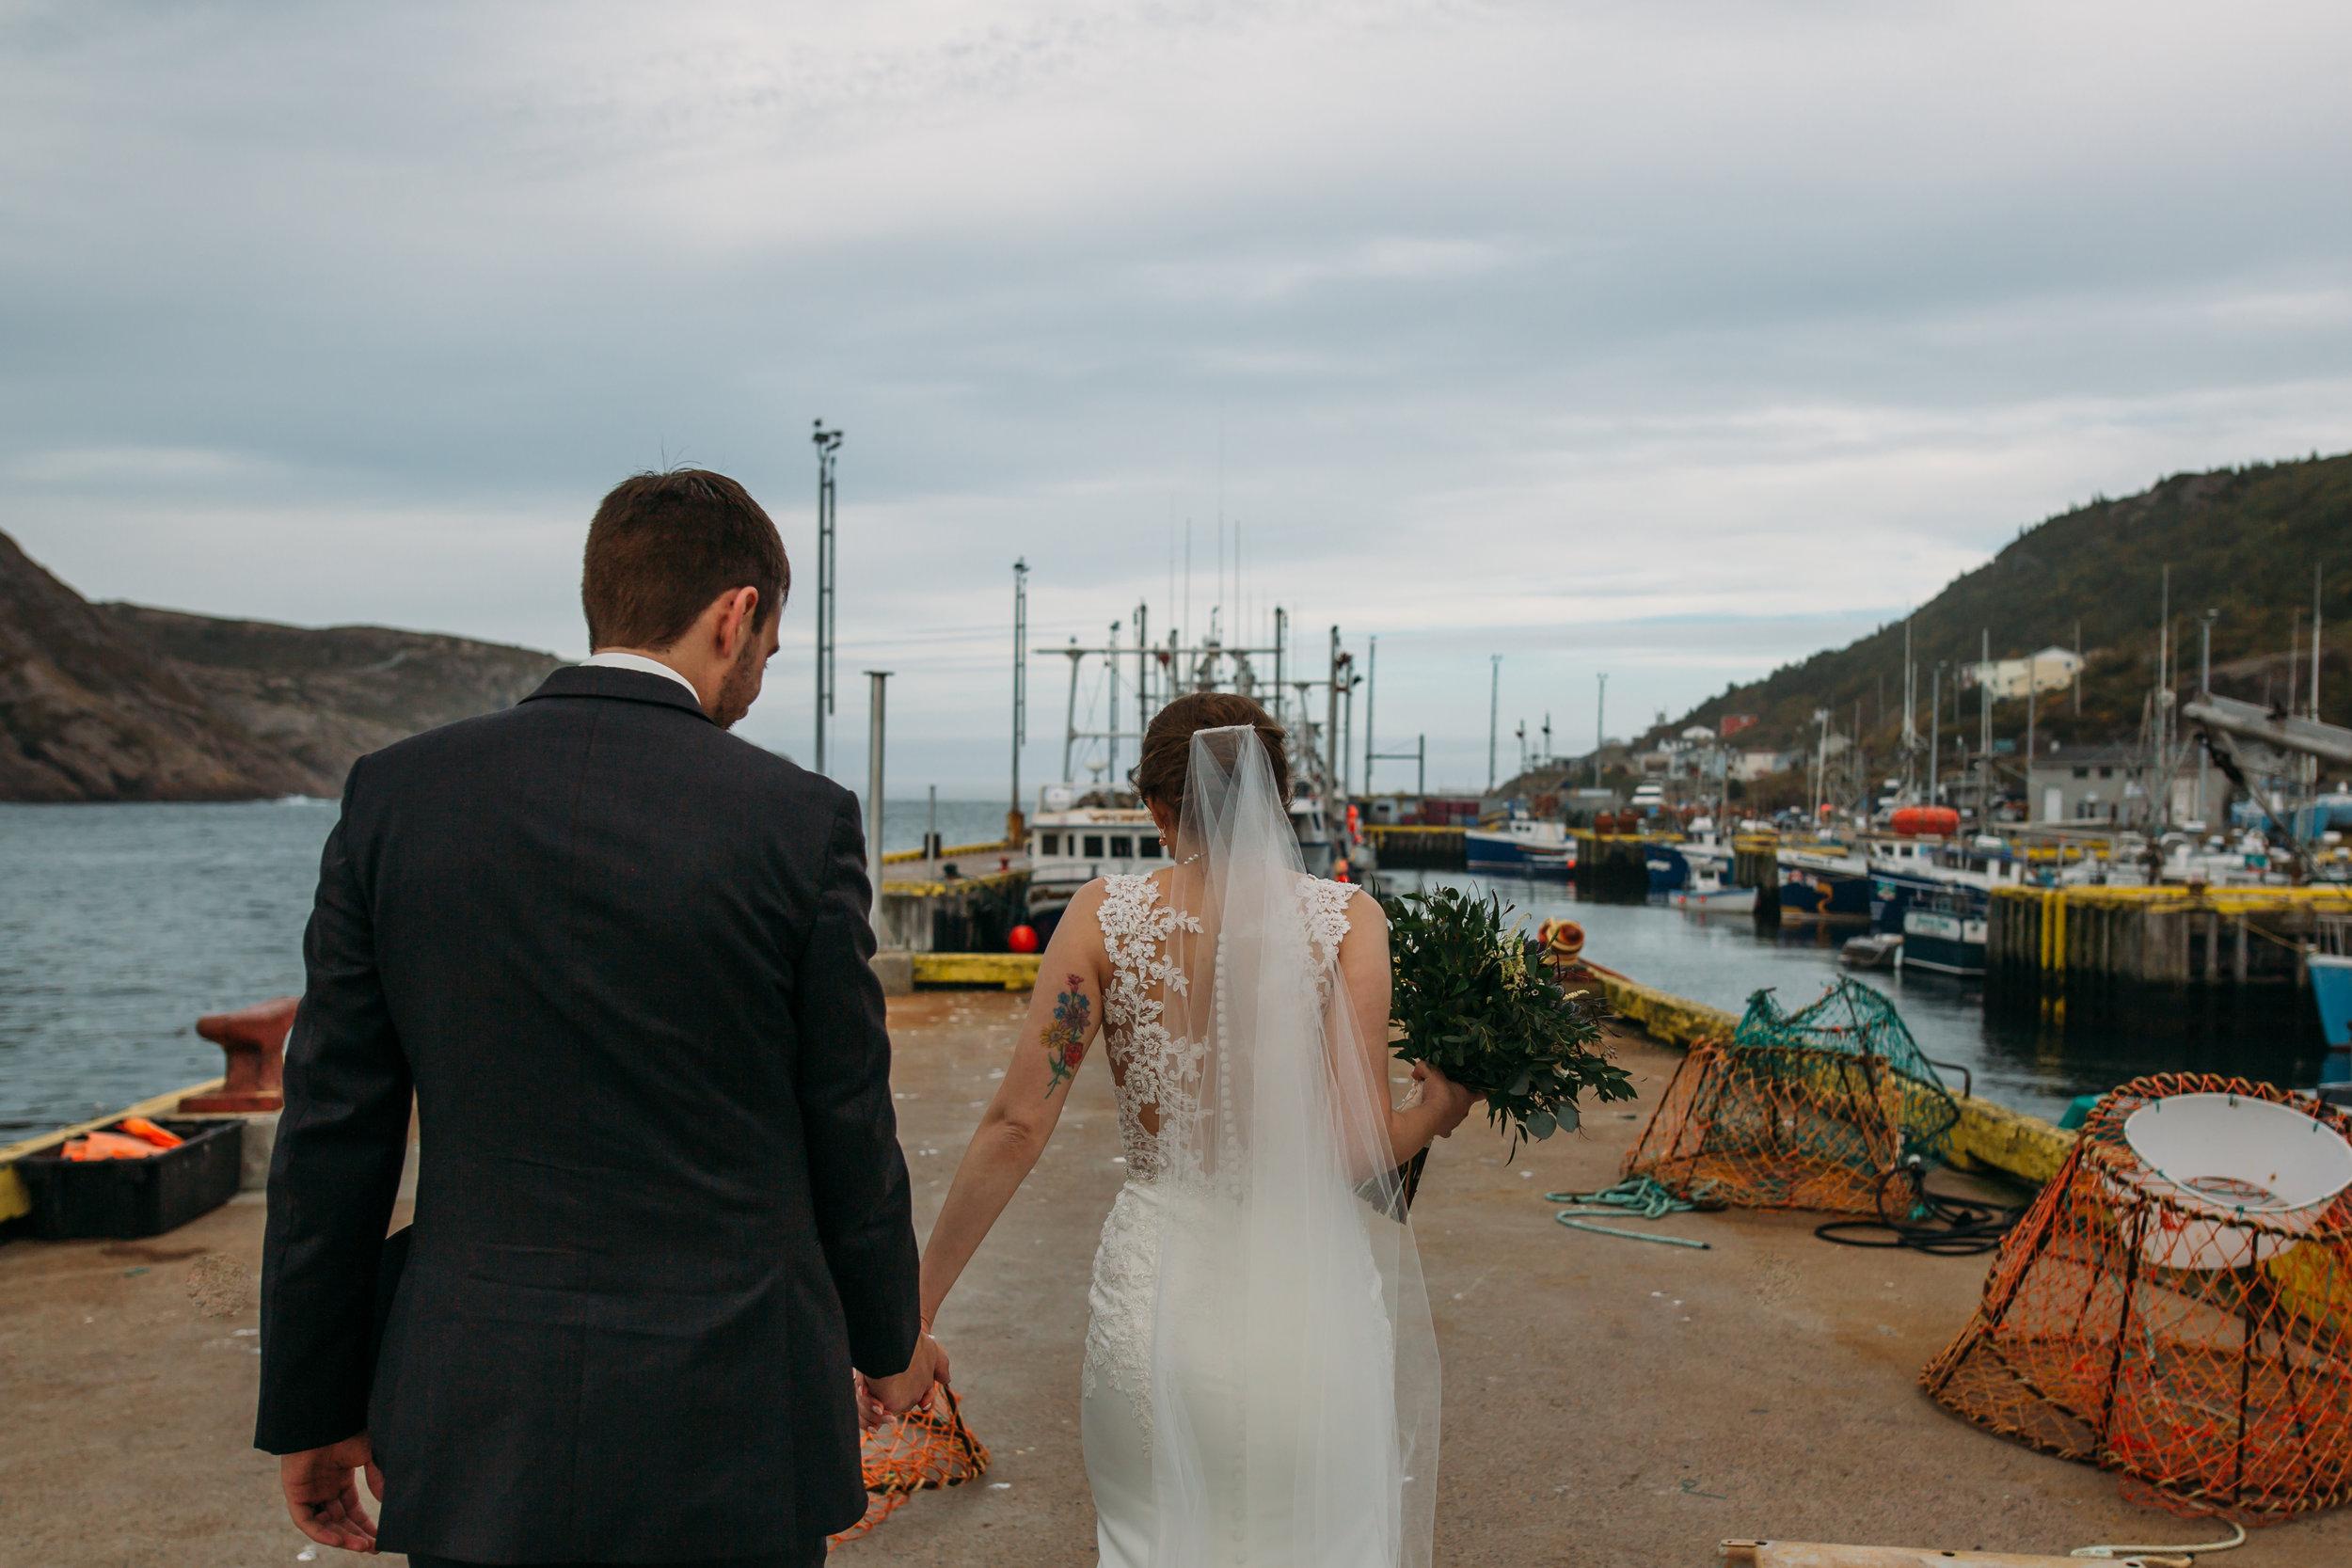 Fort Amhertst, St. John's, Newfoundland wedding photo